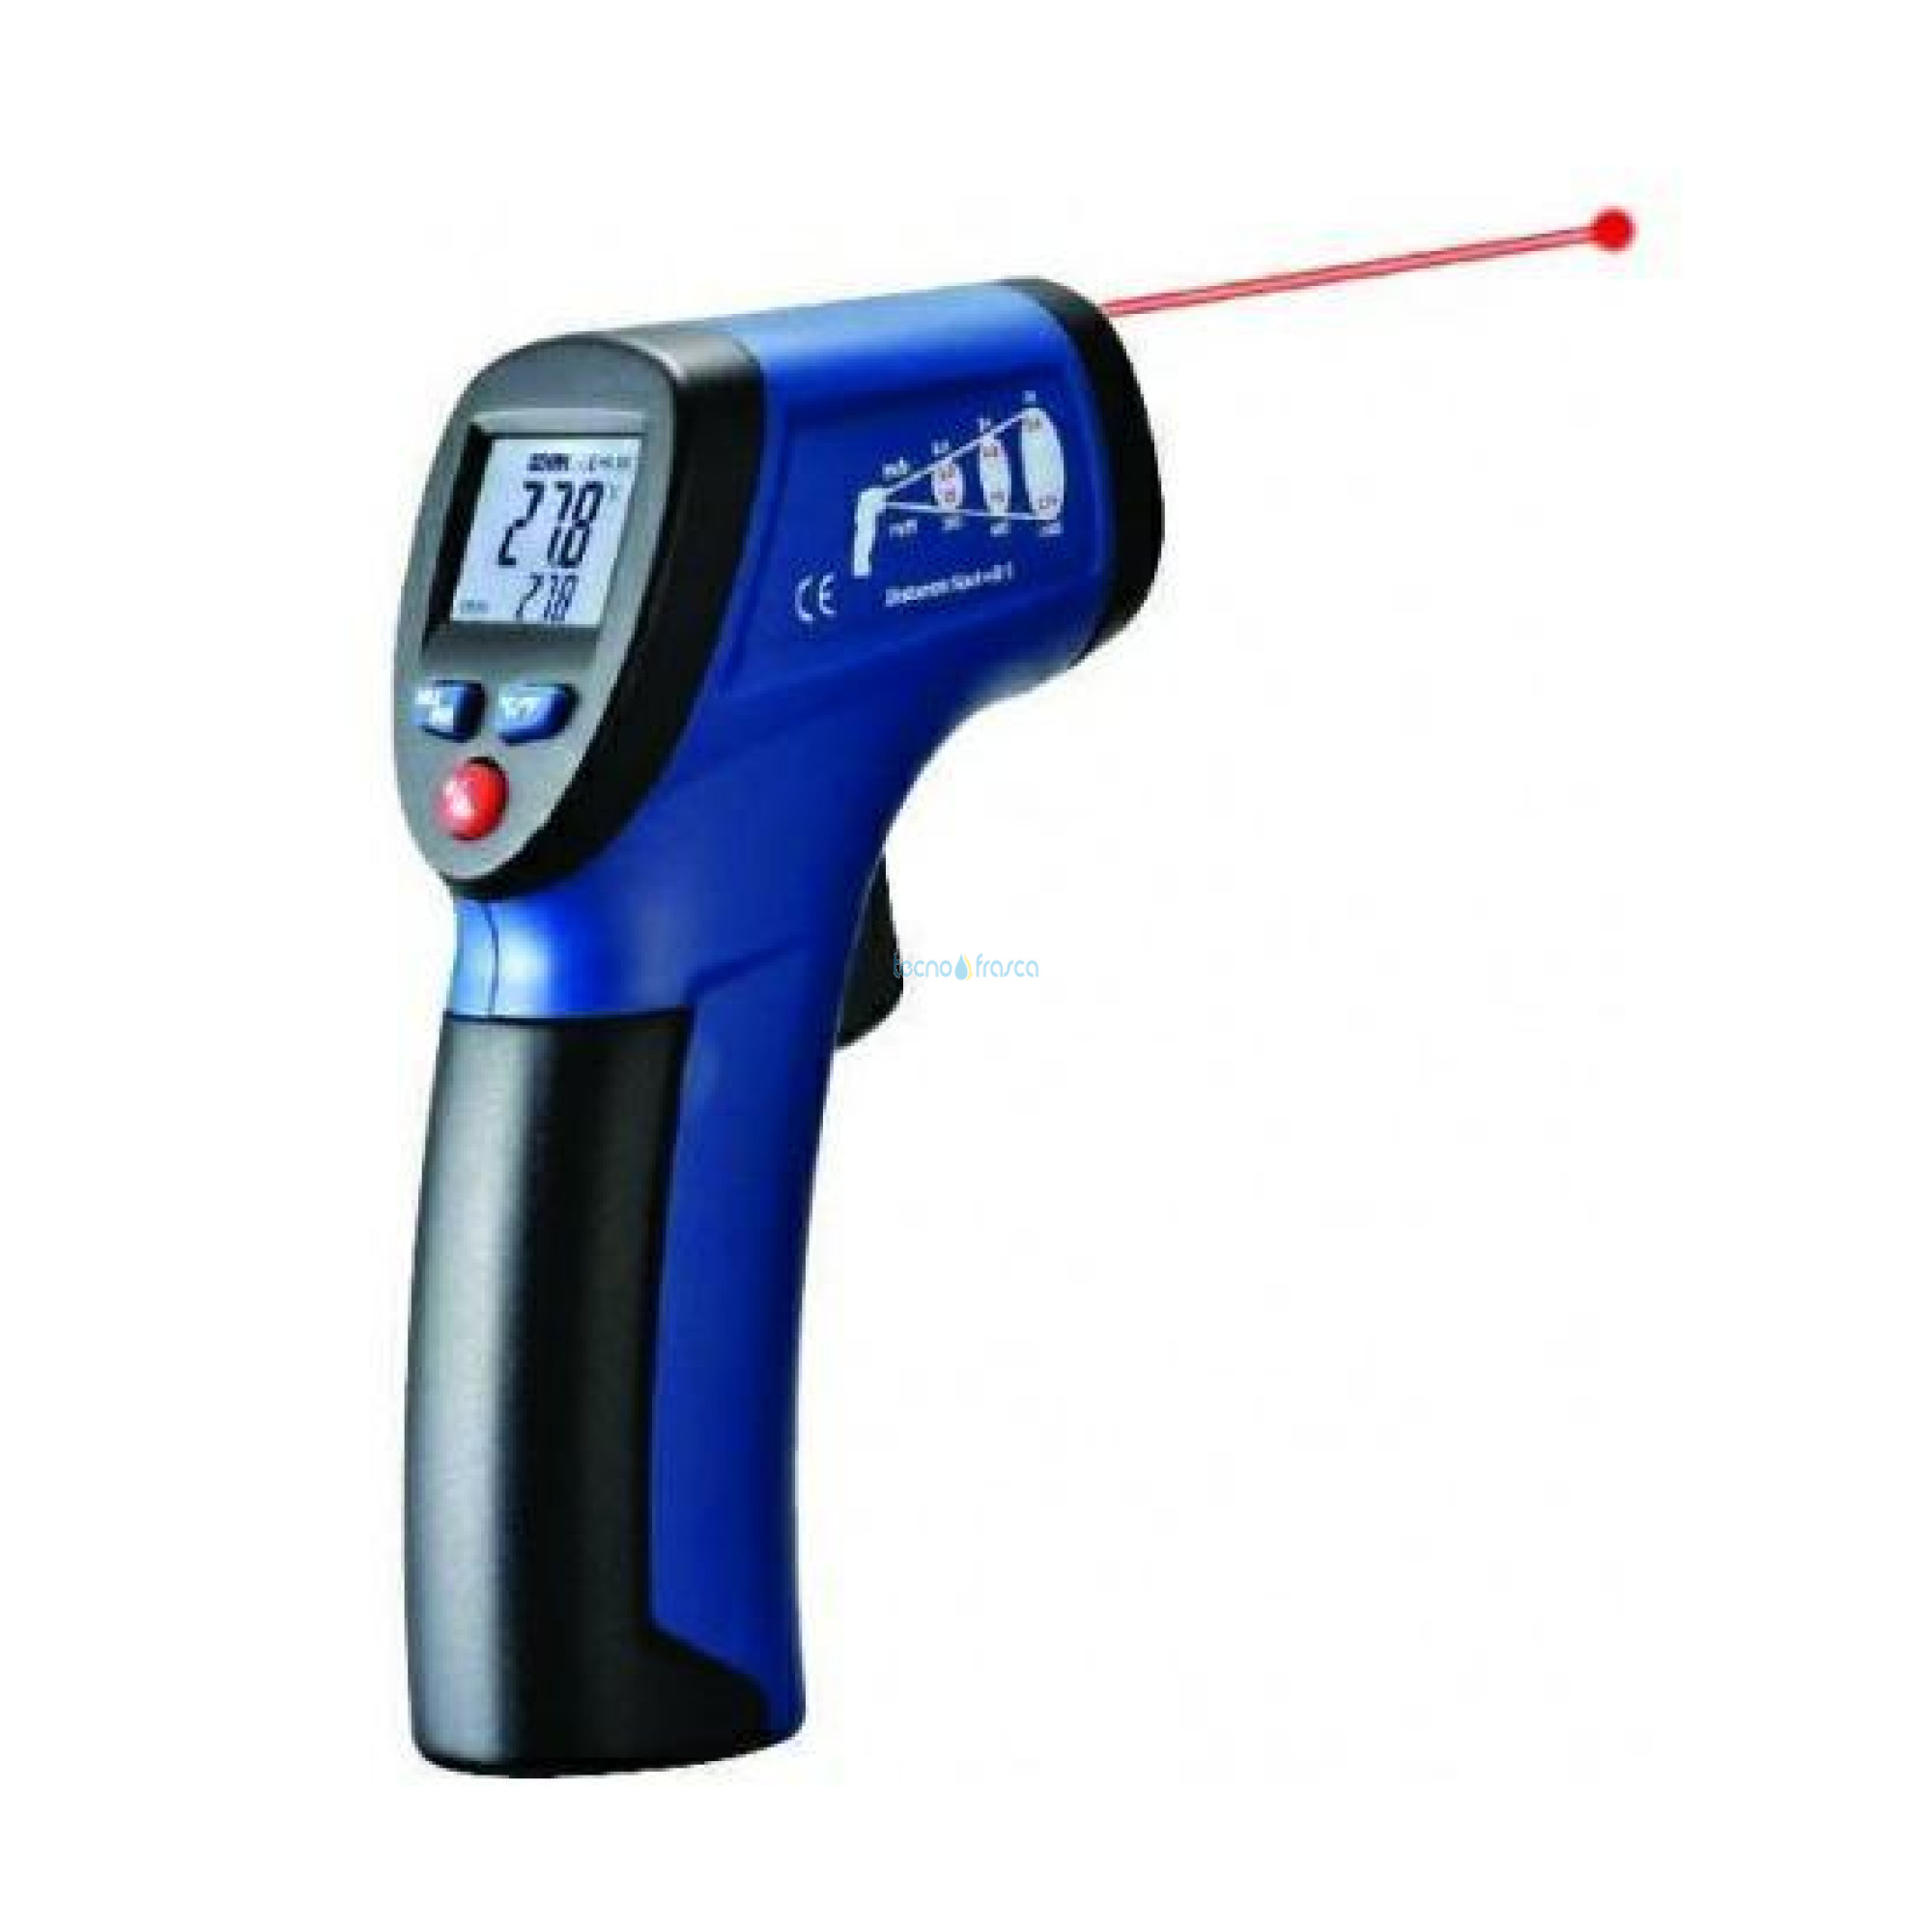 Termometro ad infrarosso wt1